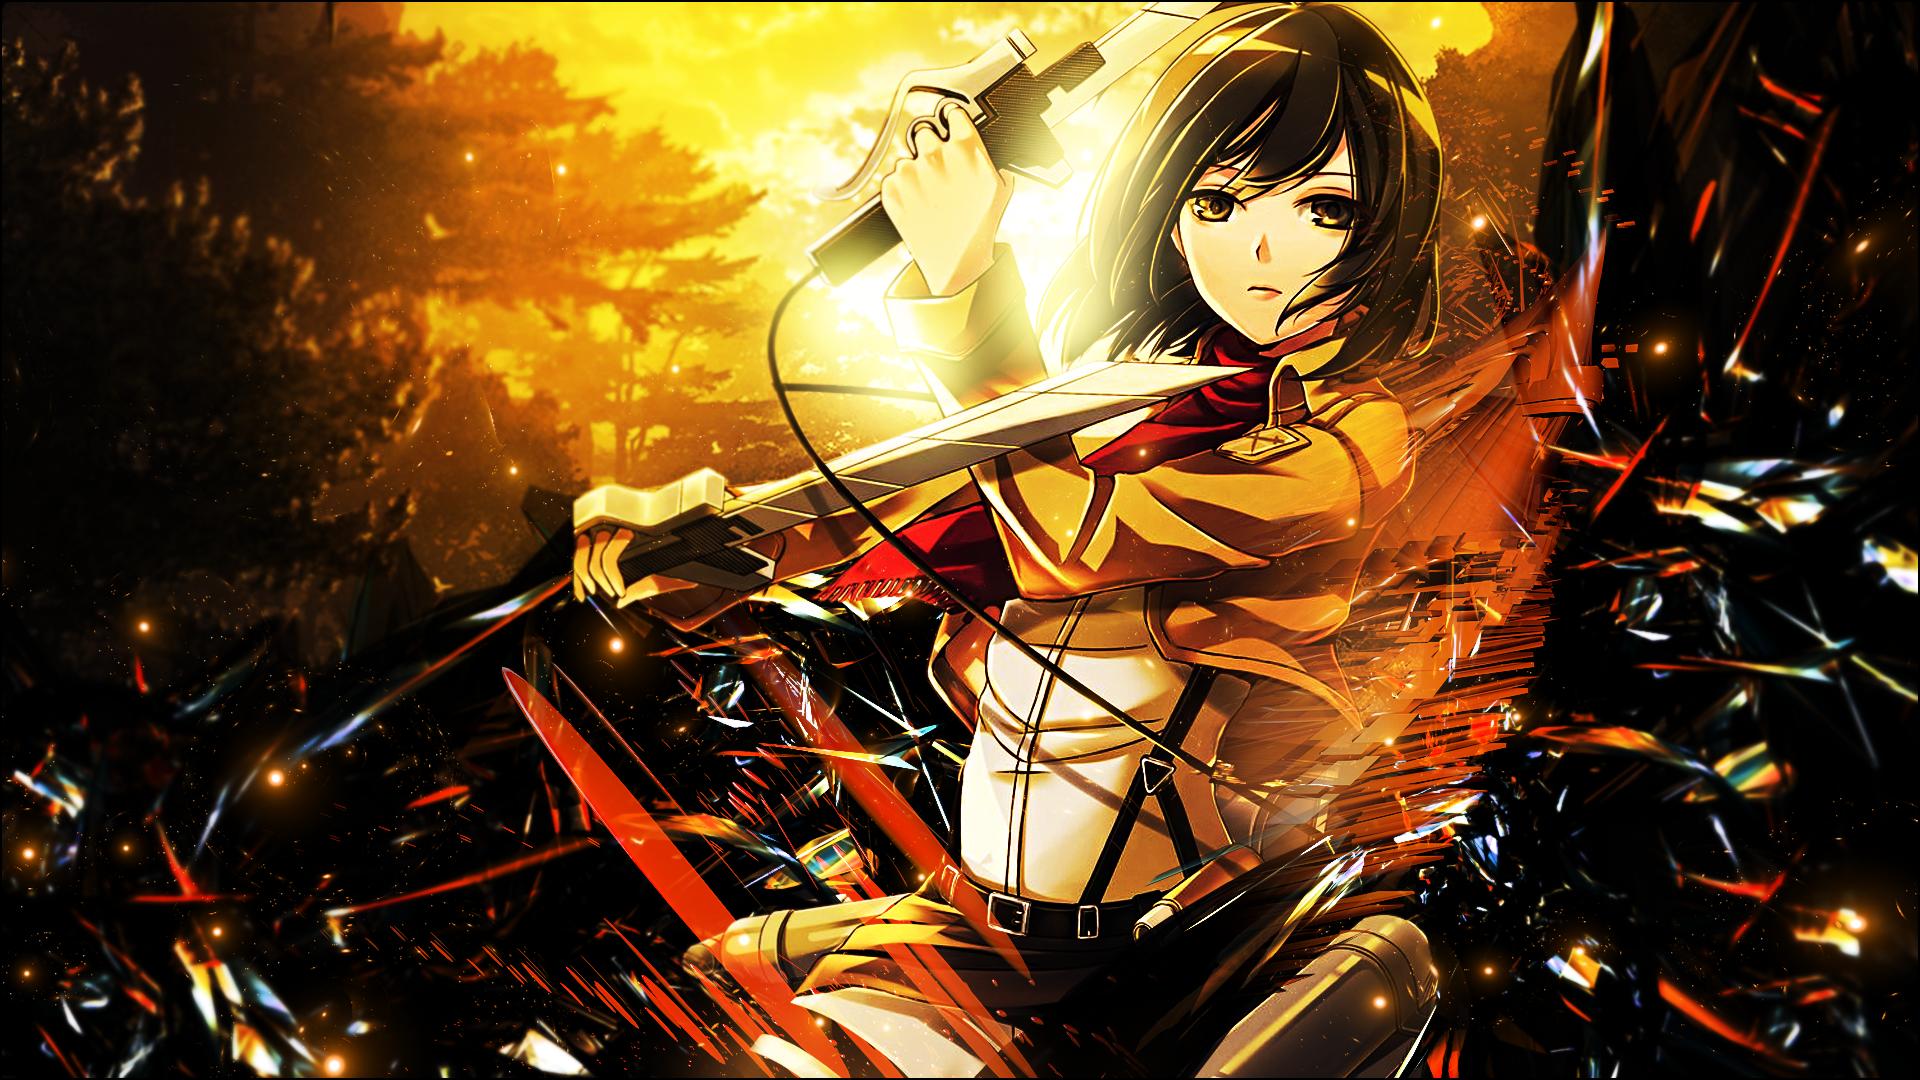 Anime 1920x1080 Shingeki no Kyojin Mikasa Ackerman anime anime girls